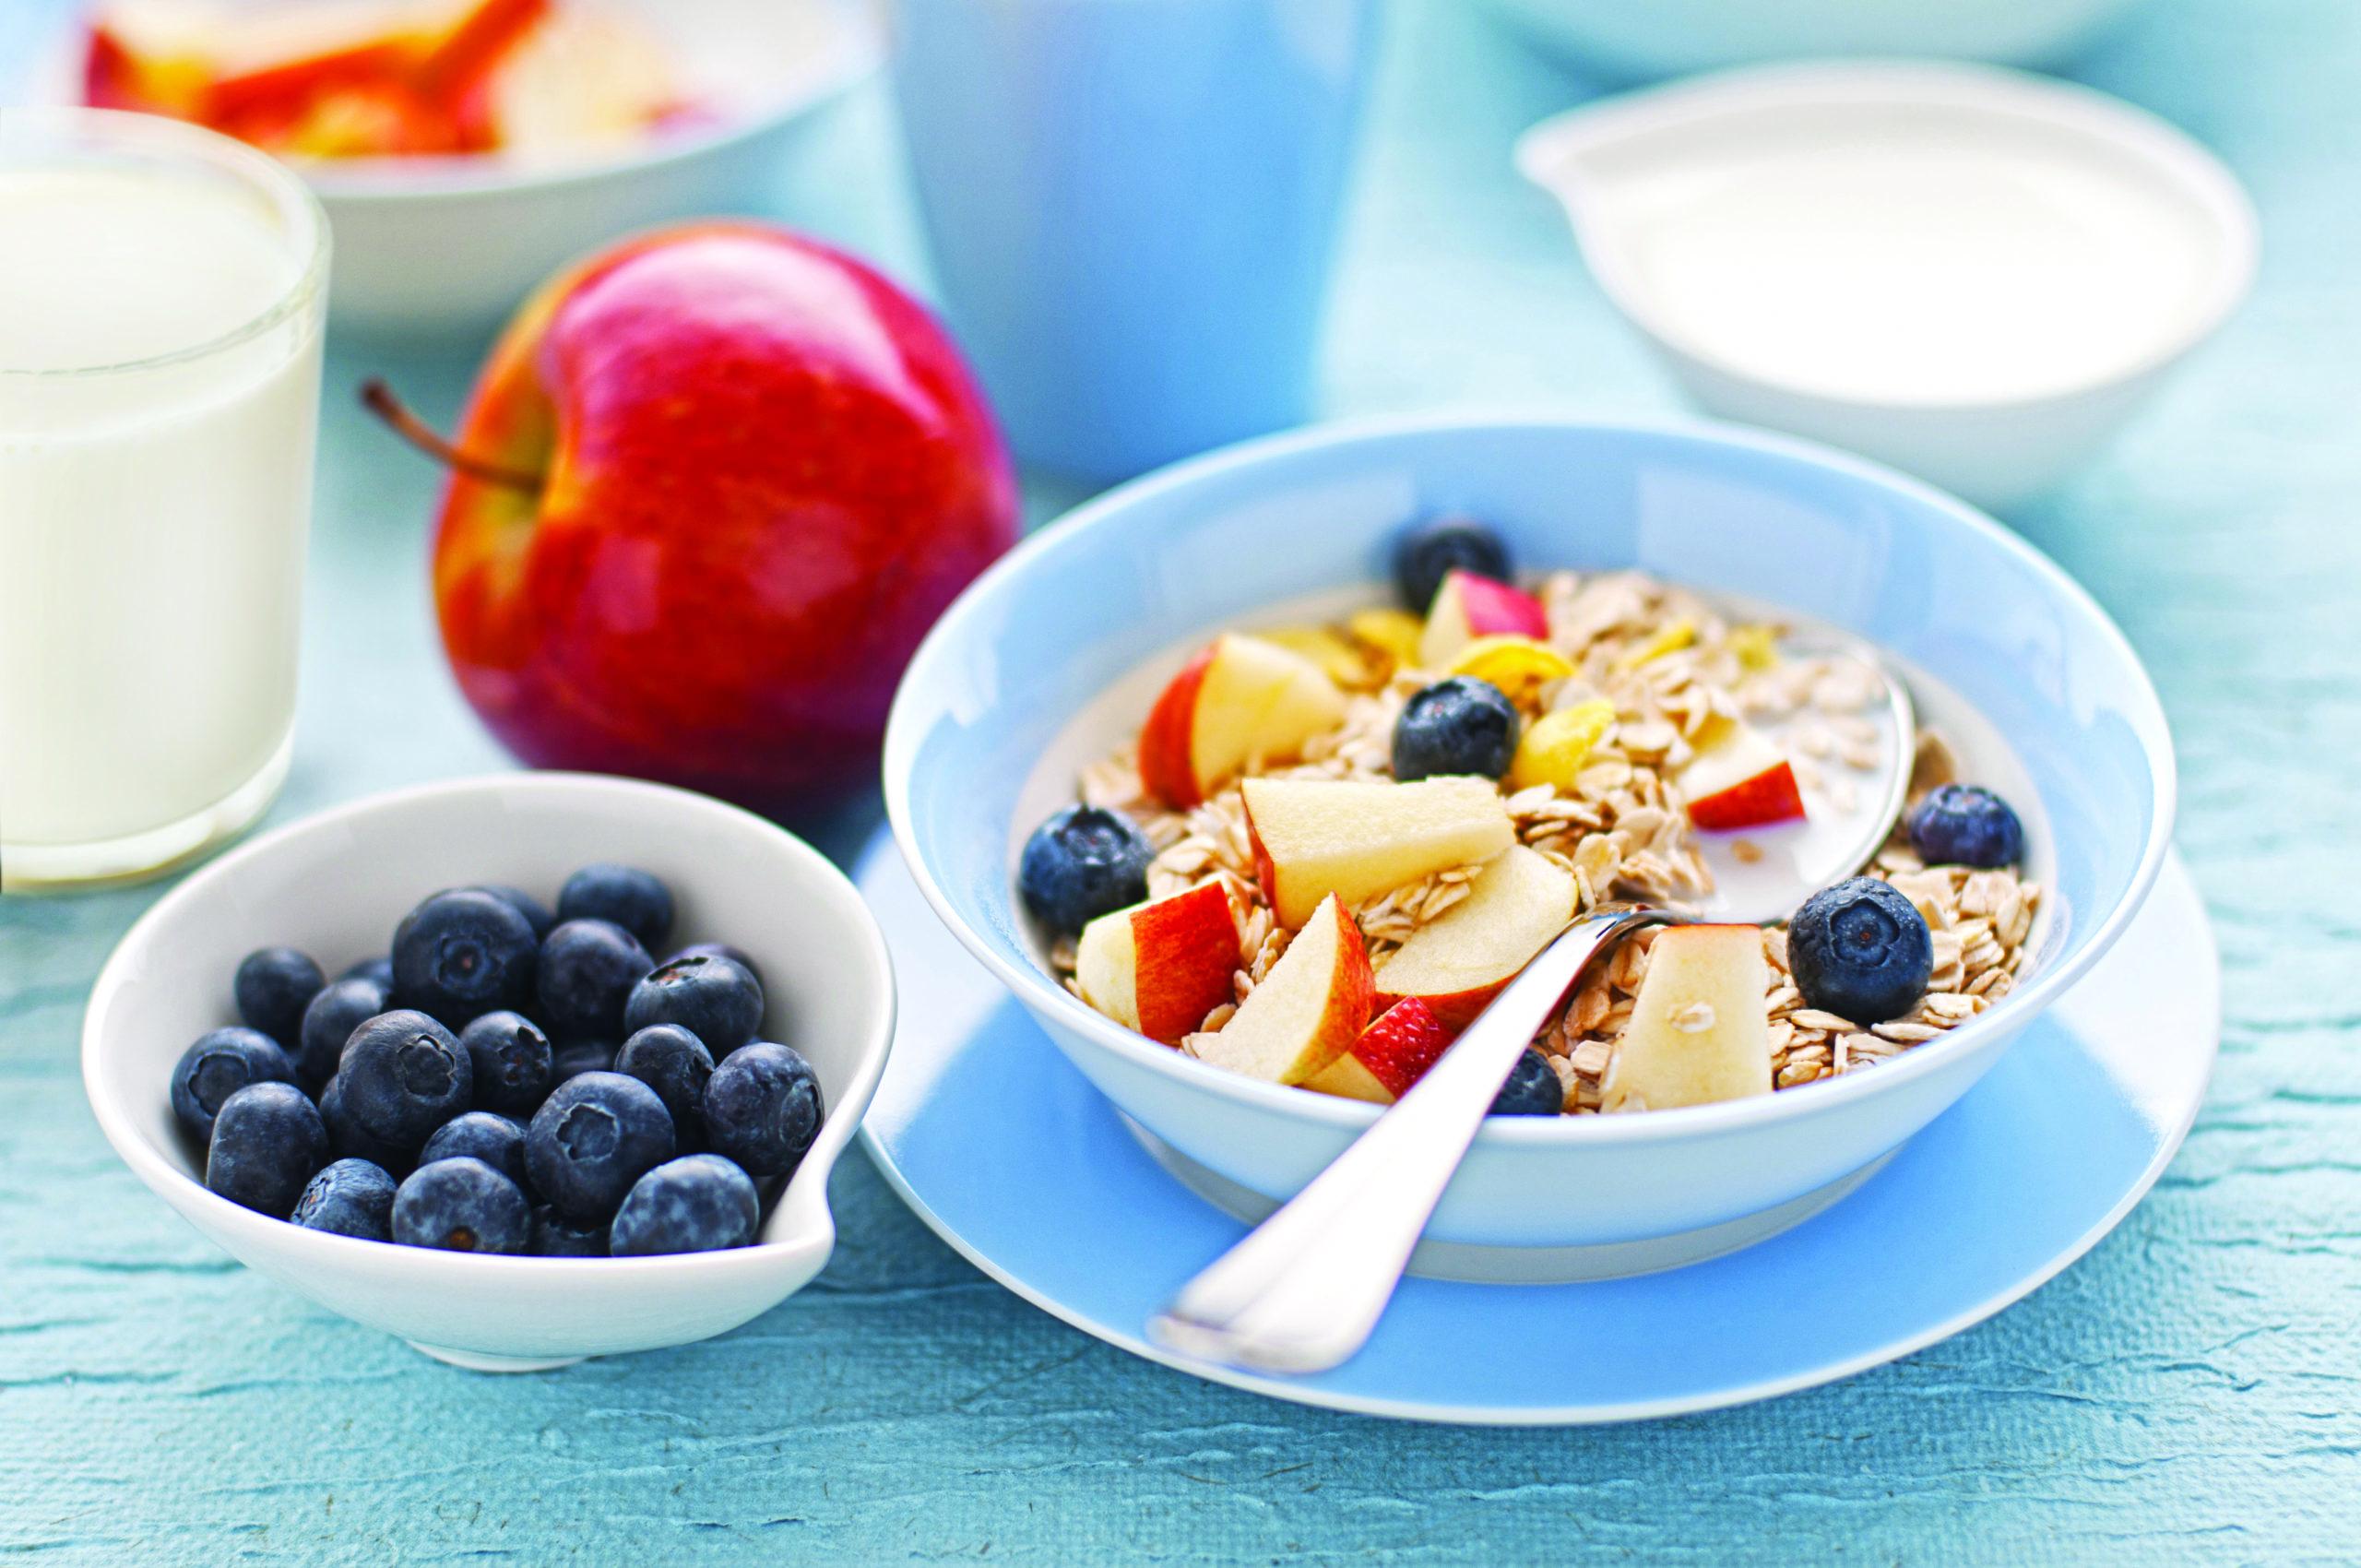 healthy breakfast food groups balanced meal best brand blue milk cereal fruit